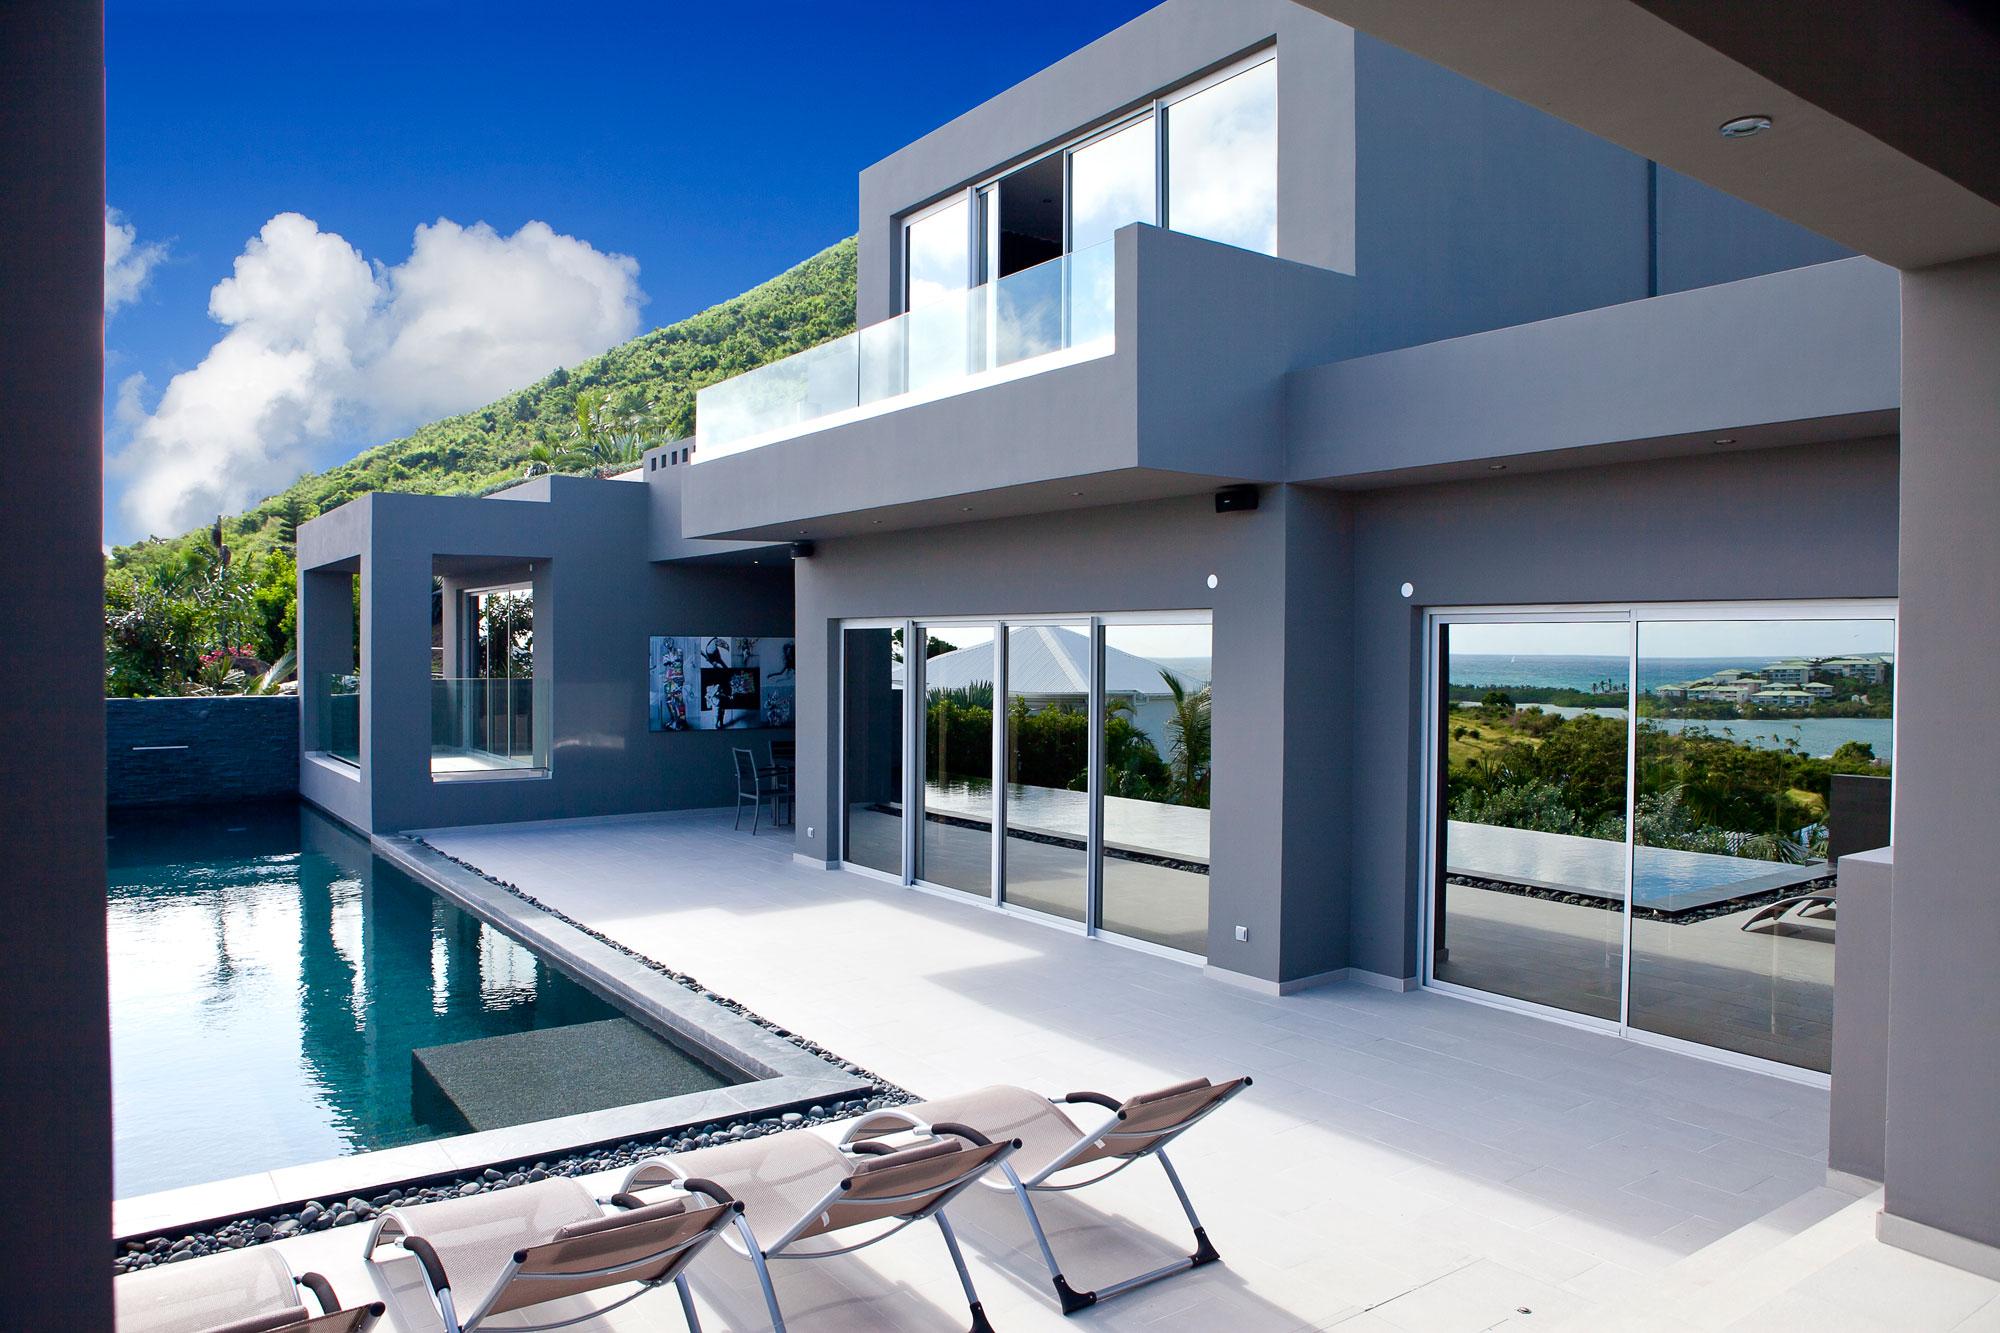 Emvie Villa - For Sale in St. Martin   MAC Caribbean Villas